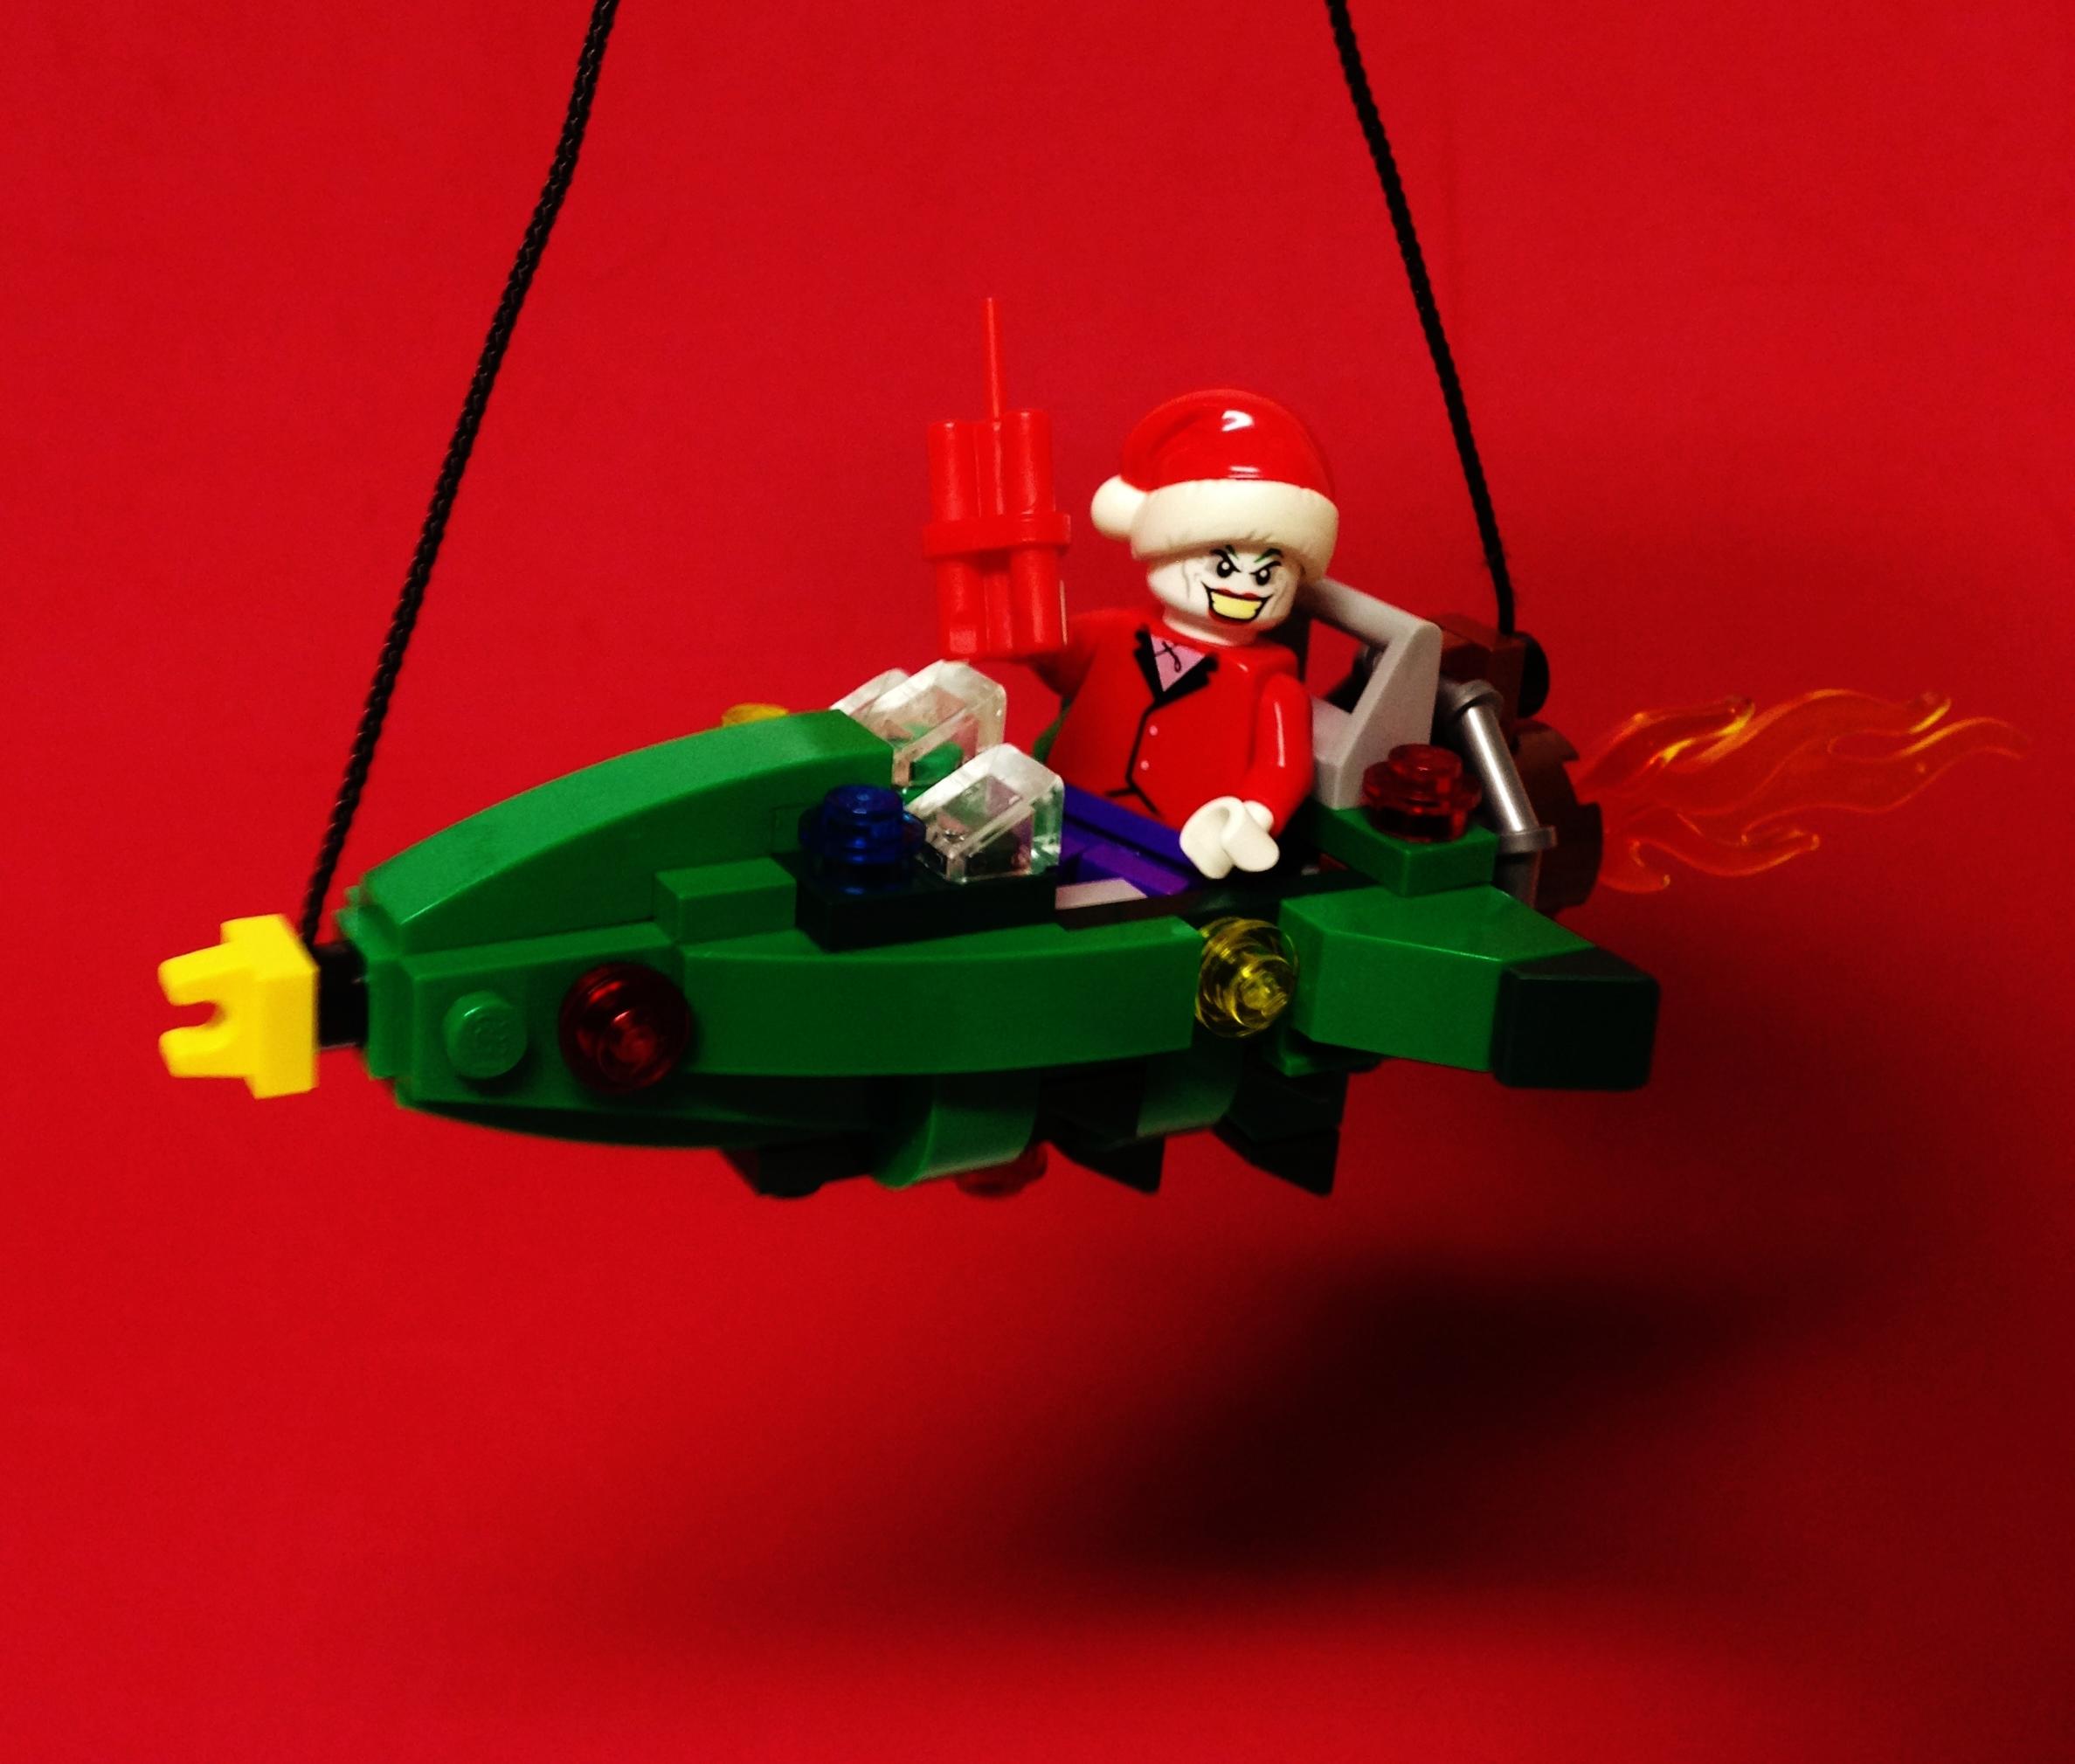 Wallpaper : Christmas, LEGO, ornament, Batman, Joker, series ...